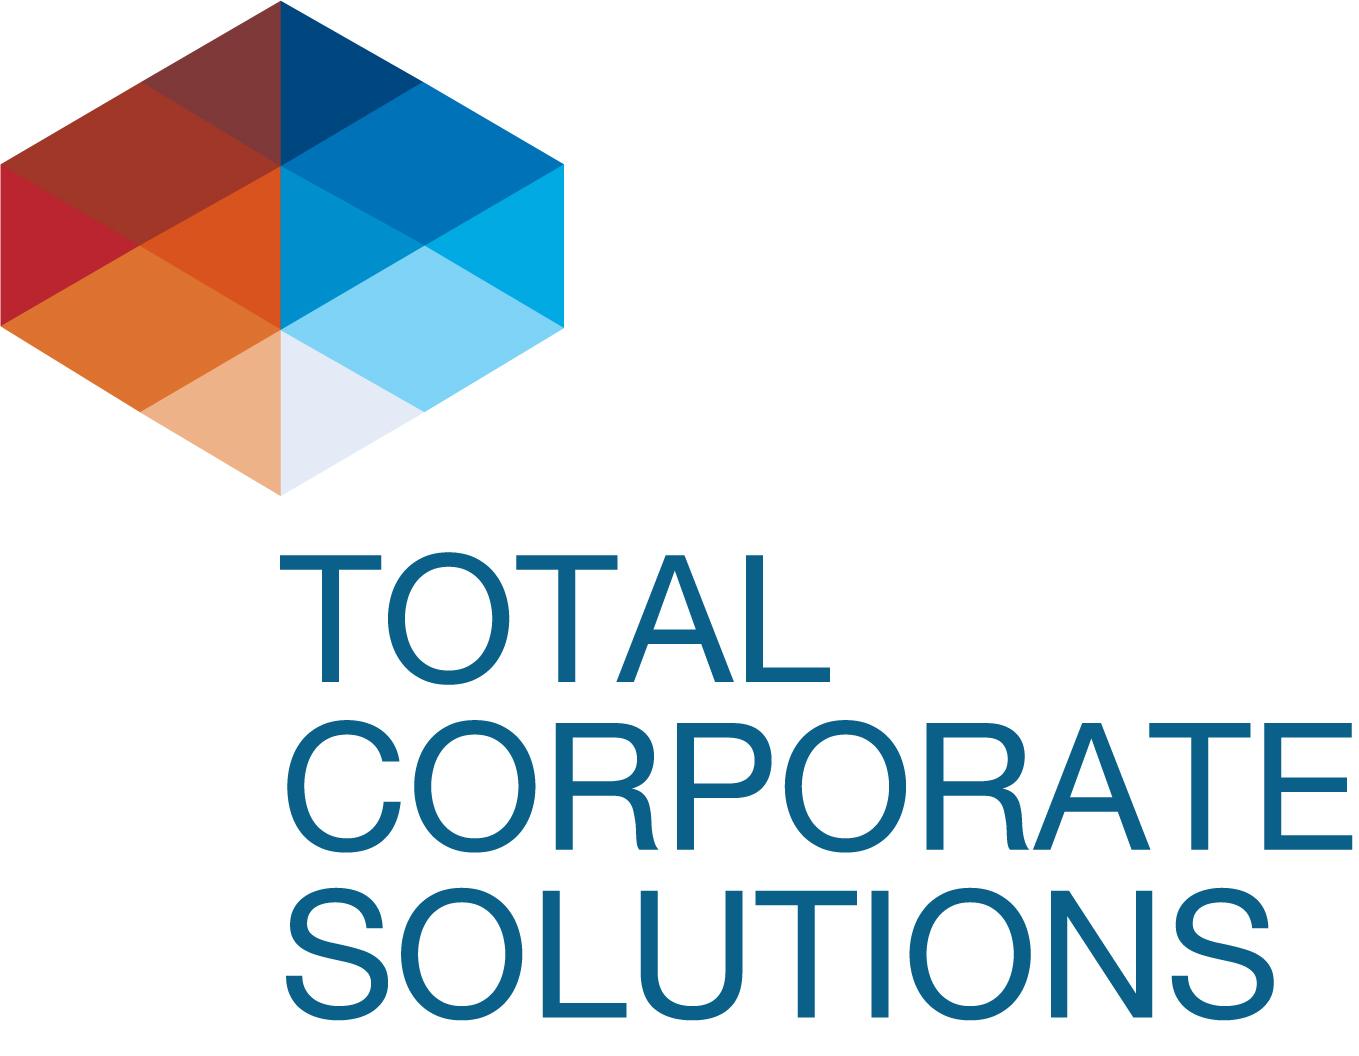 Total Corporate